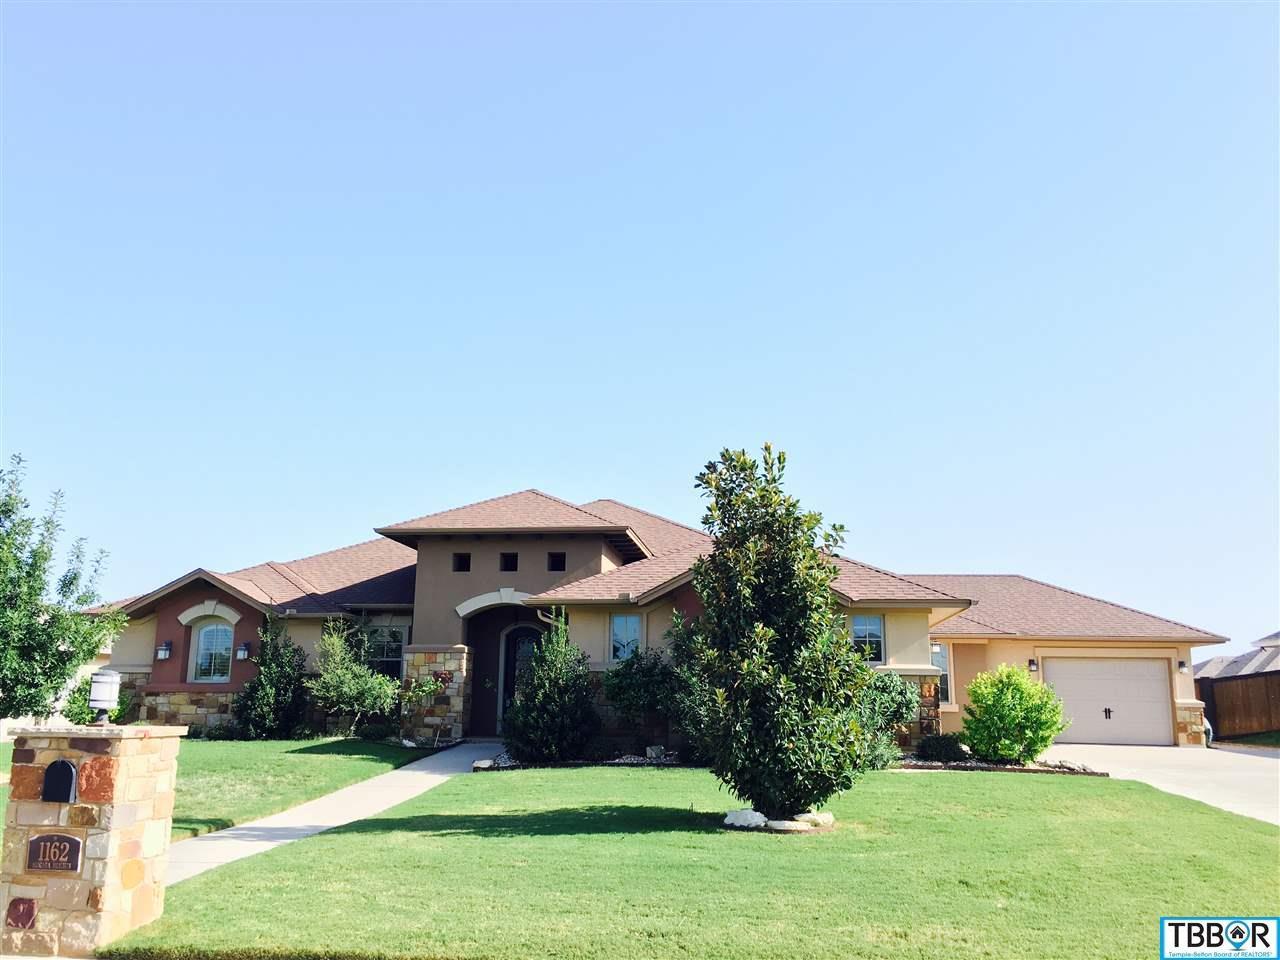 1162 Niagara Heights, Belton TX 76513 - Photo 1